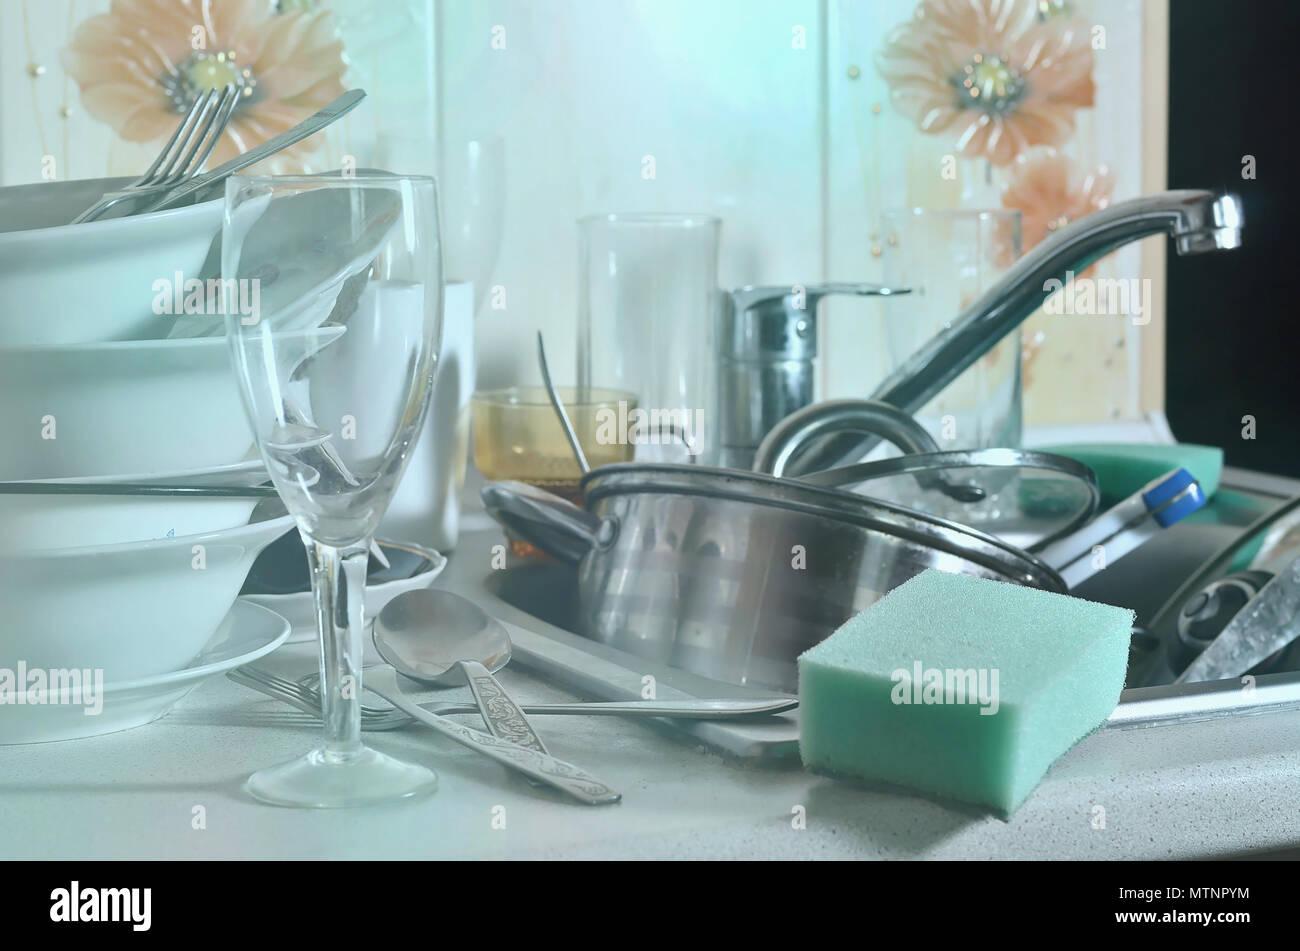 Washing Kitchen Utensils In Sink Stock Photos & Washing Kitchen ...